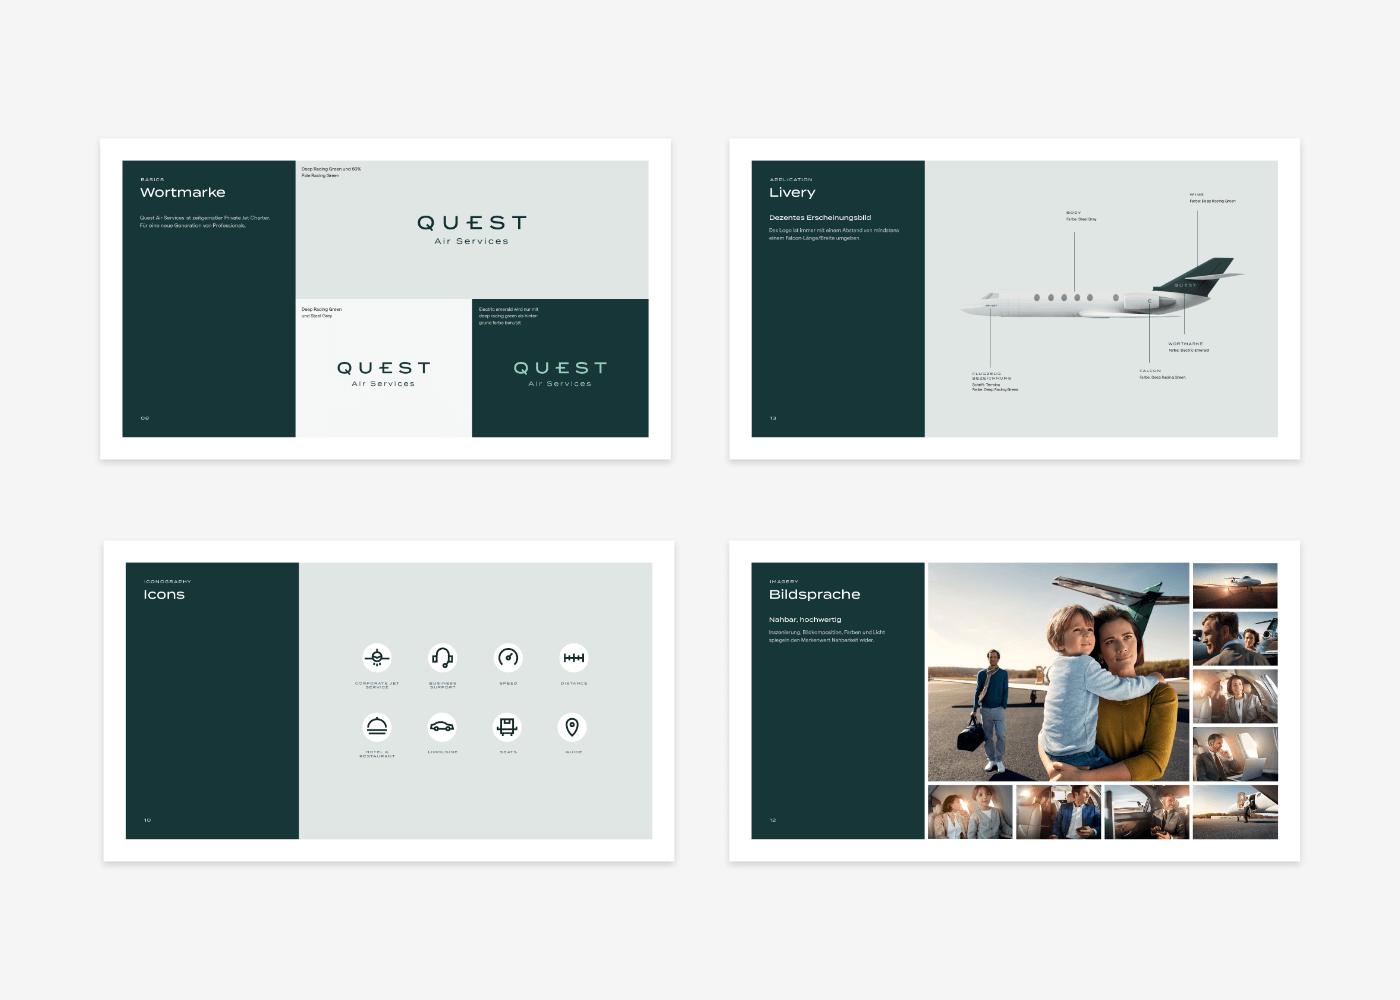 Quest Brand Design Manual